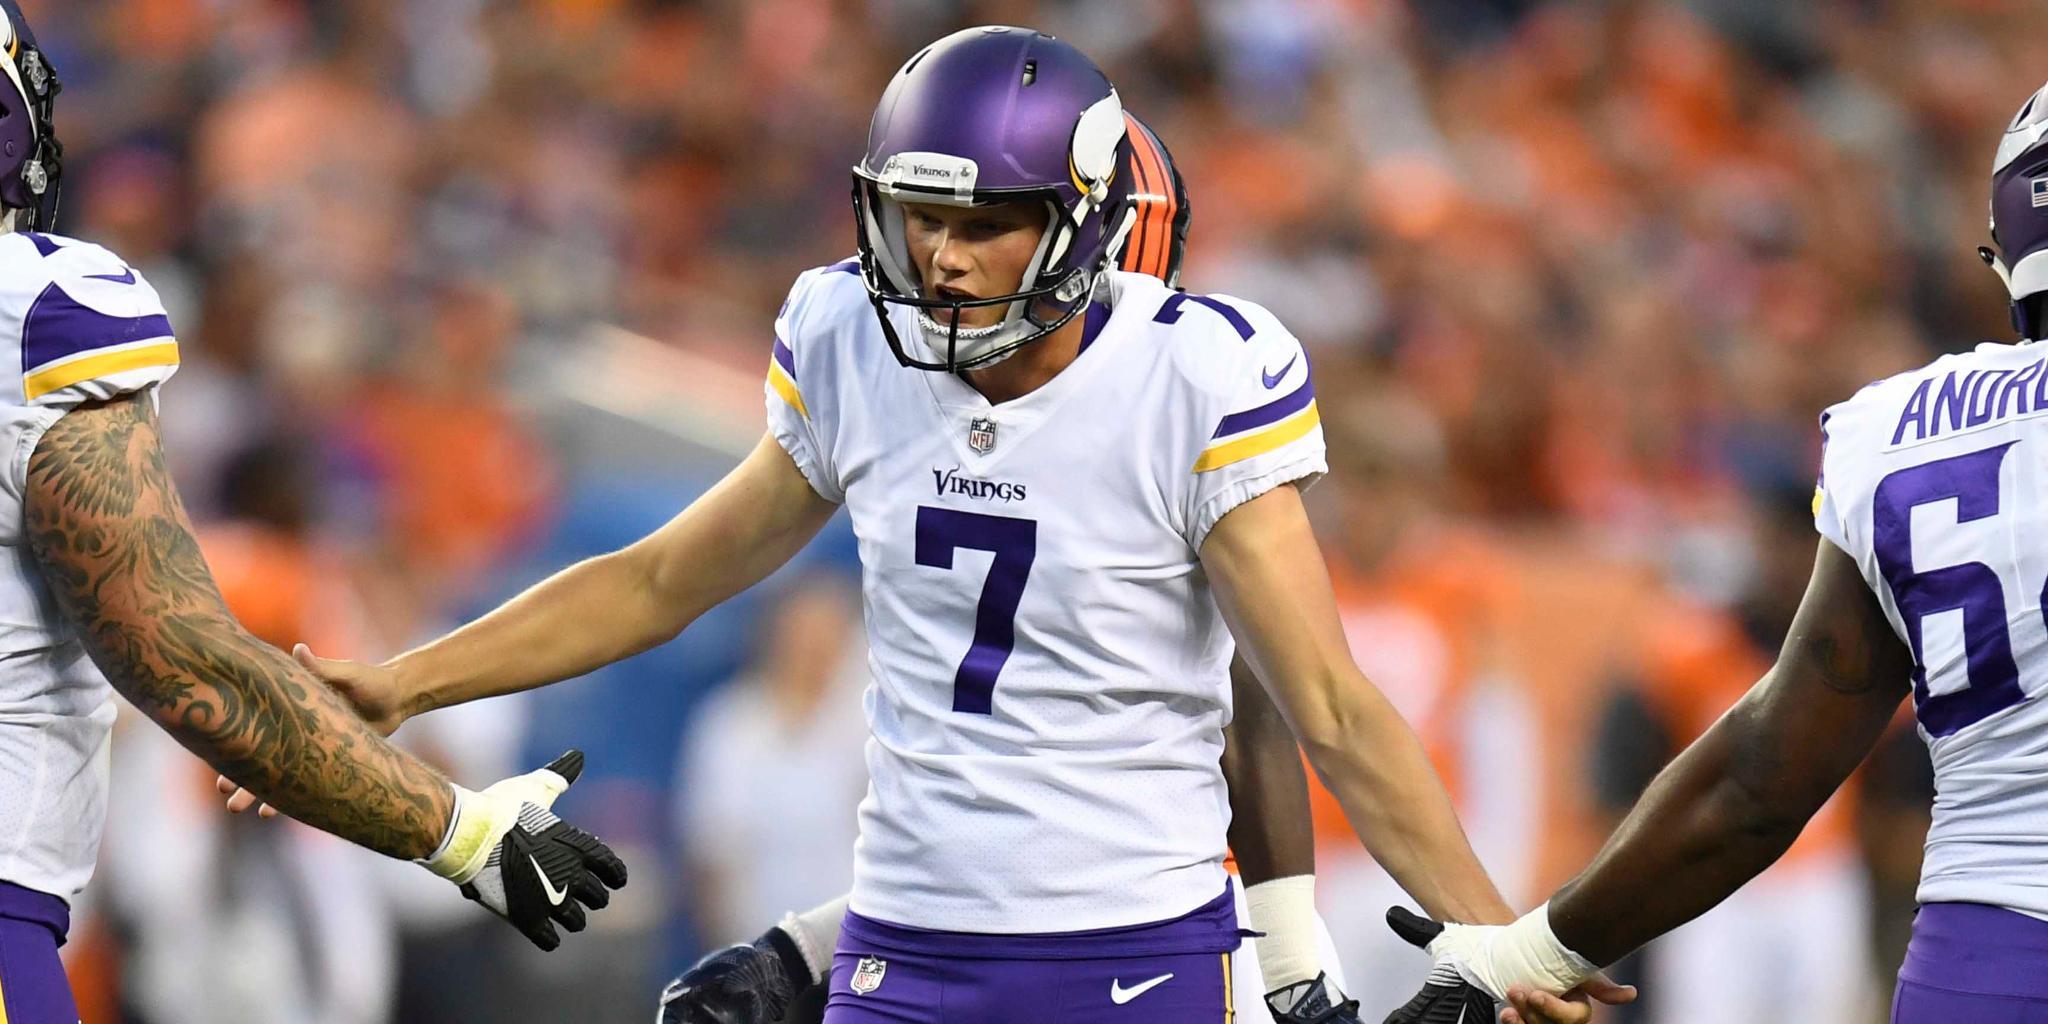 .@Vikings make a choice at kicker, release veteran: https://t.co/PsvHC6kQ0d https://t.co/oPPkecEHJ2